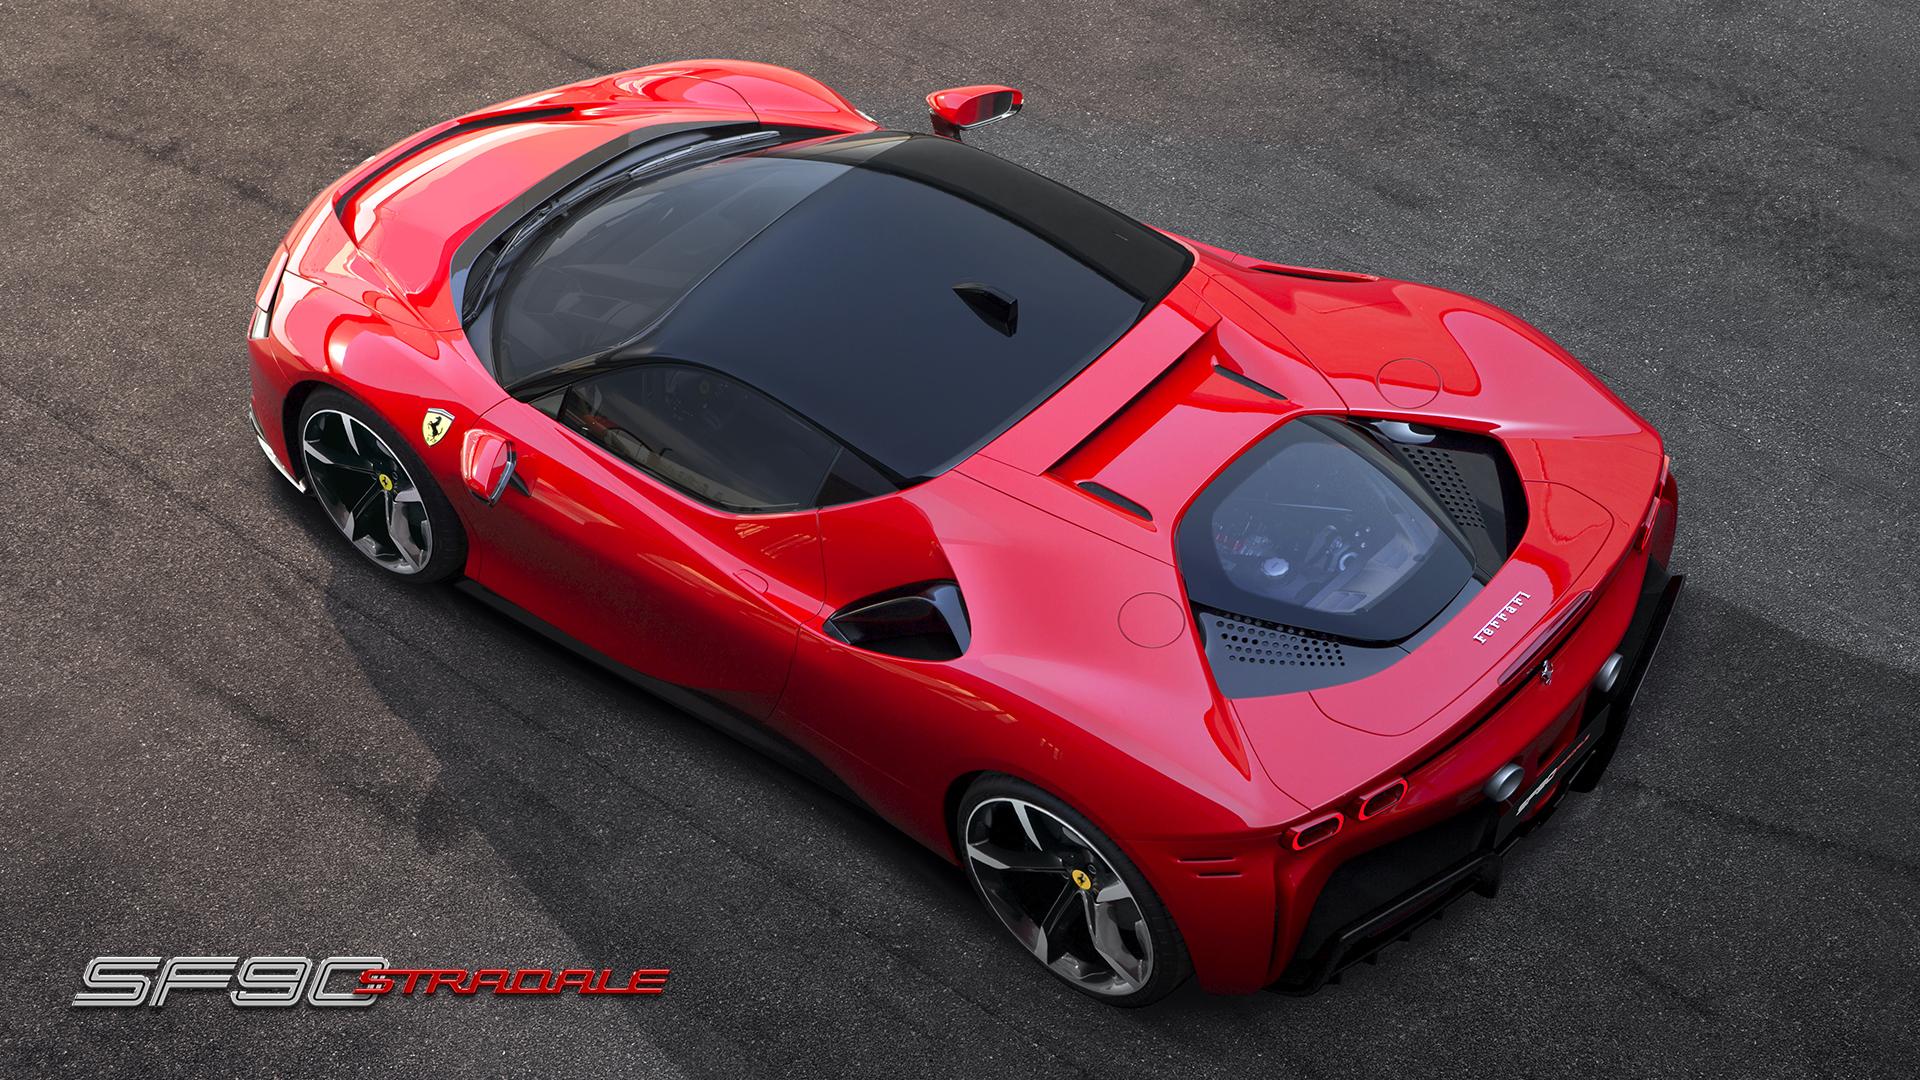 Ferrari SF90 Stradale overhead